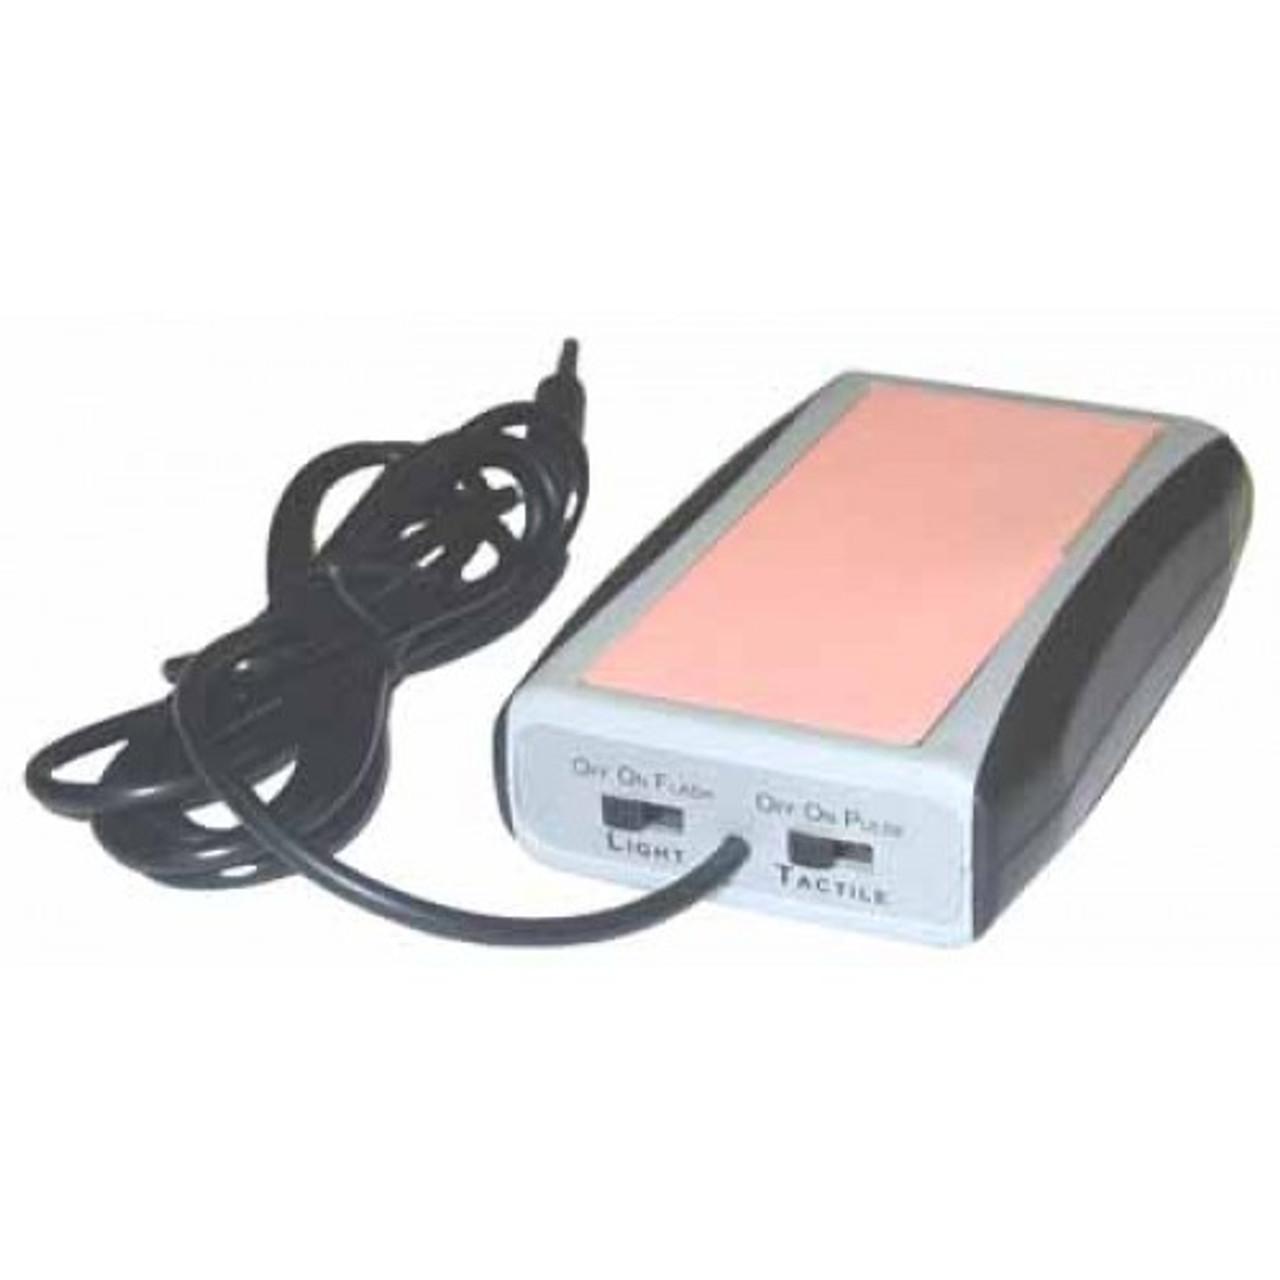 Bright Box Tactile